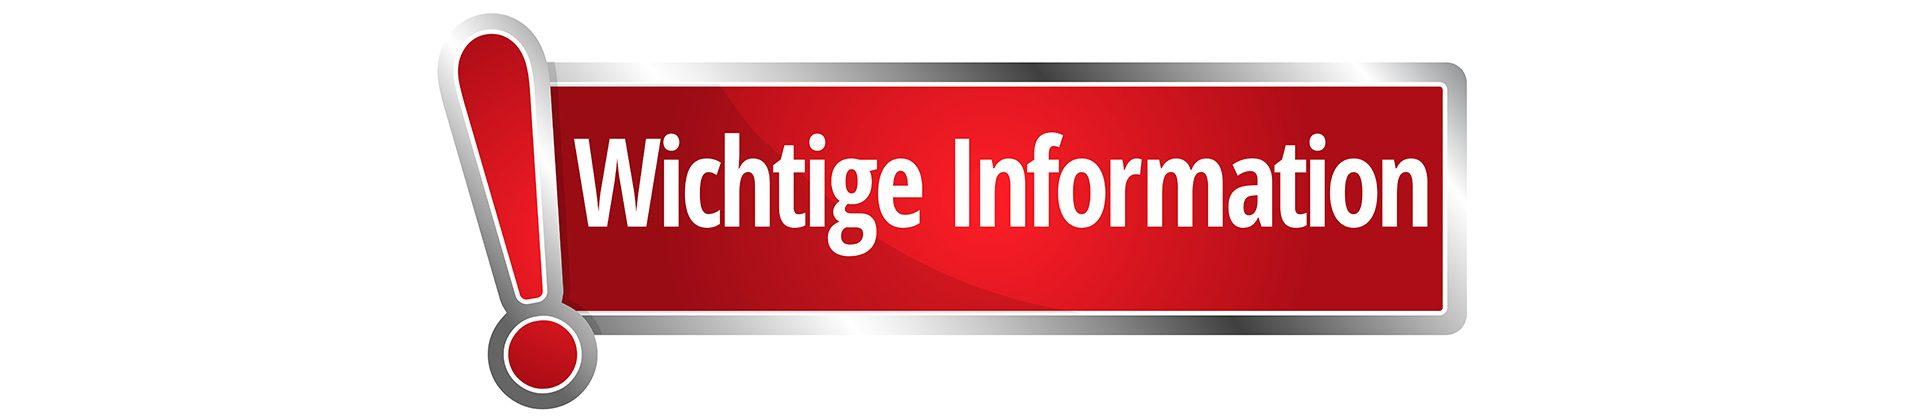 Informationen-AdobeStock_74997669-mittig